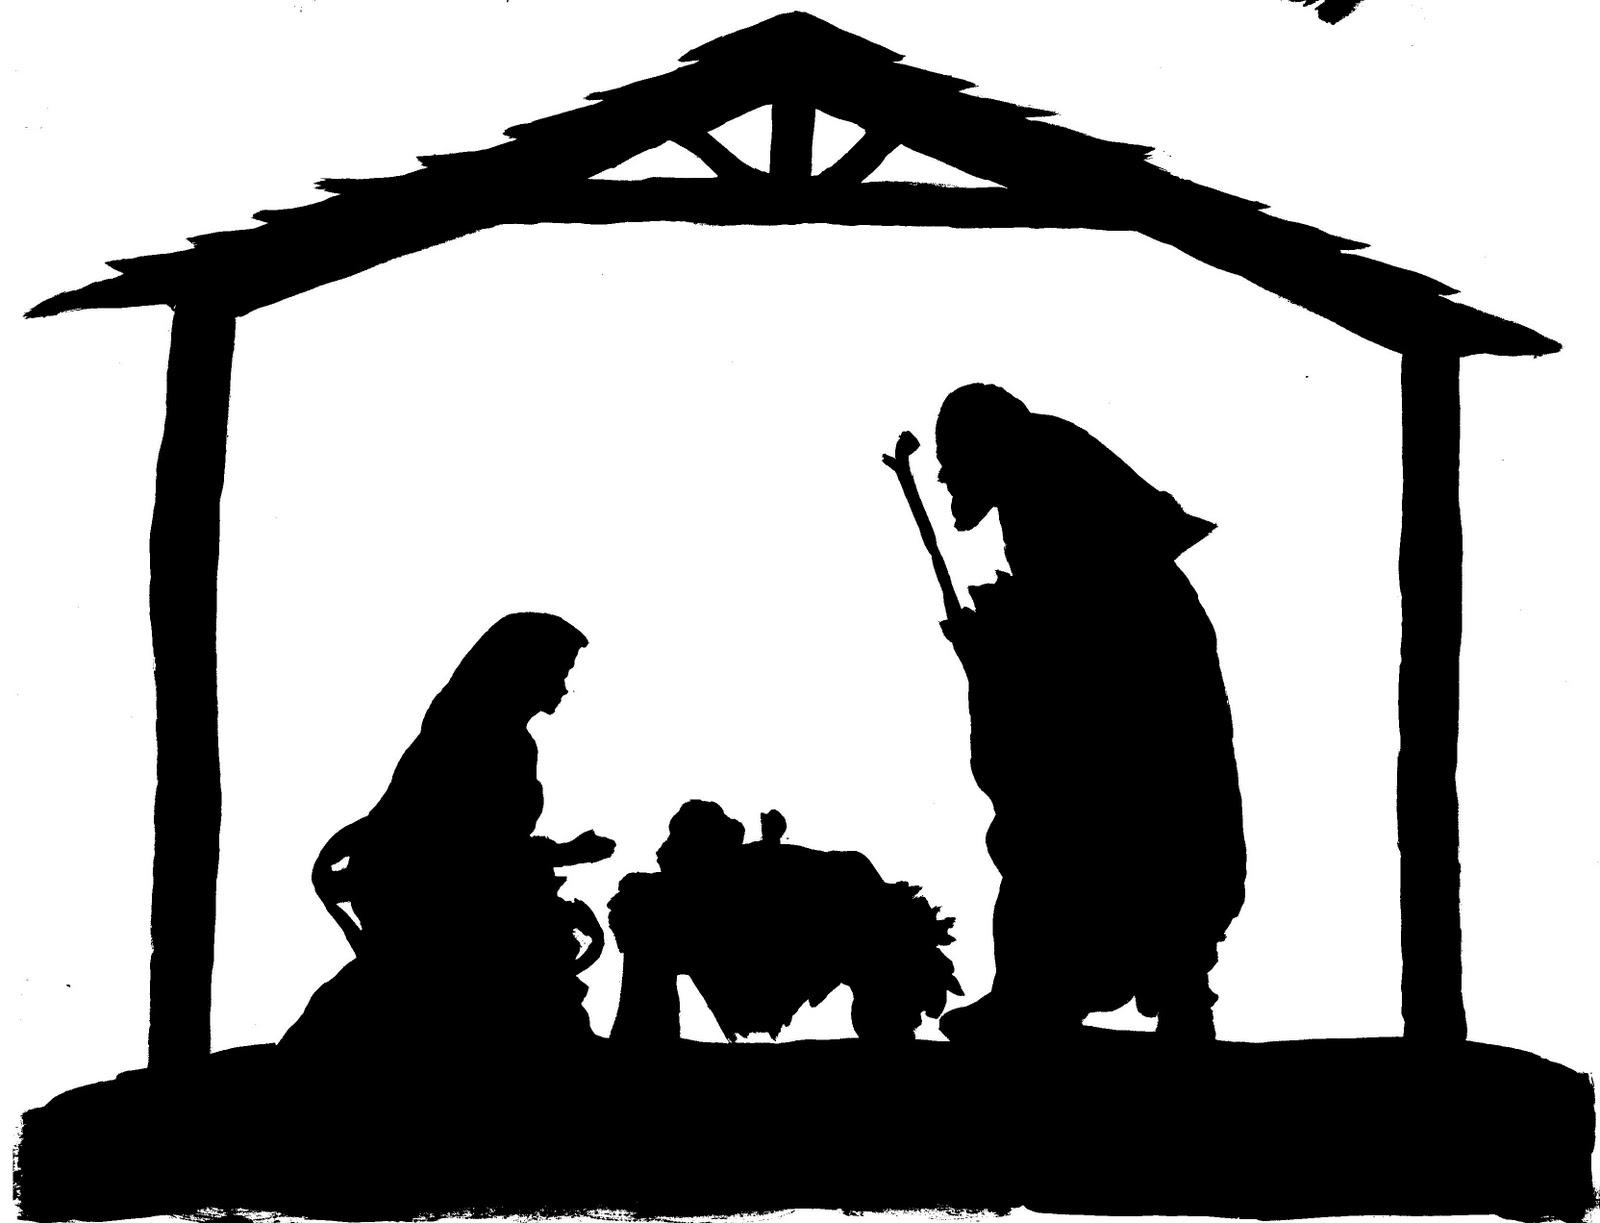 10 Nativity Silhouette Patterns Free Cli-10 Nativity Silhouette Patterns Free Cliparts That You Can Download-0